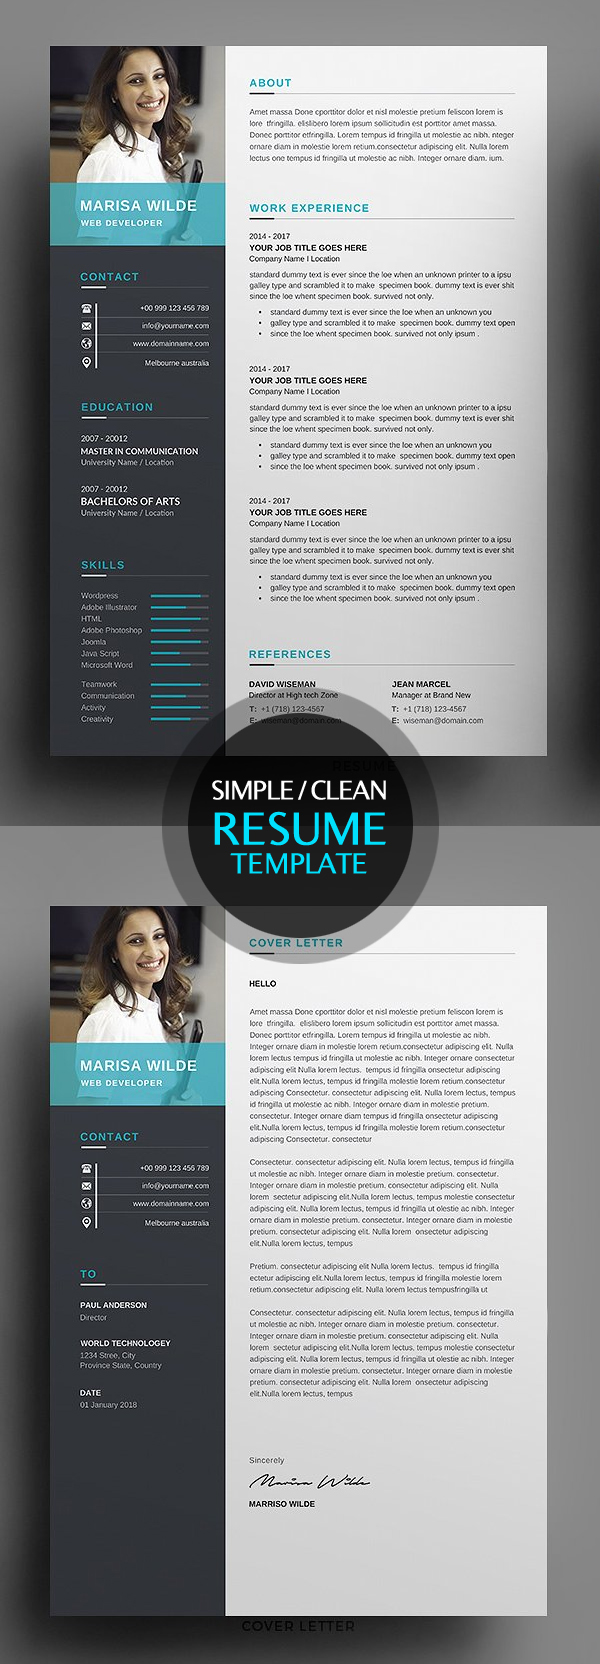 Clean Resume/CV Template 2018